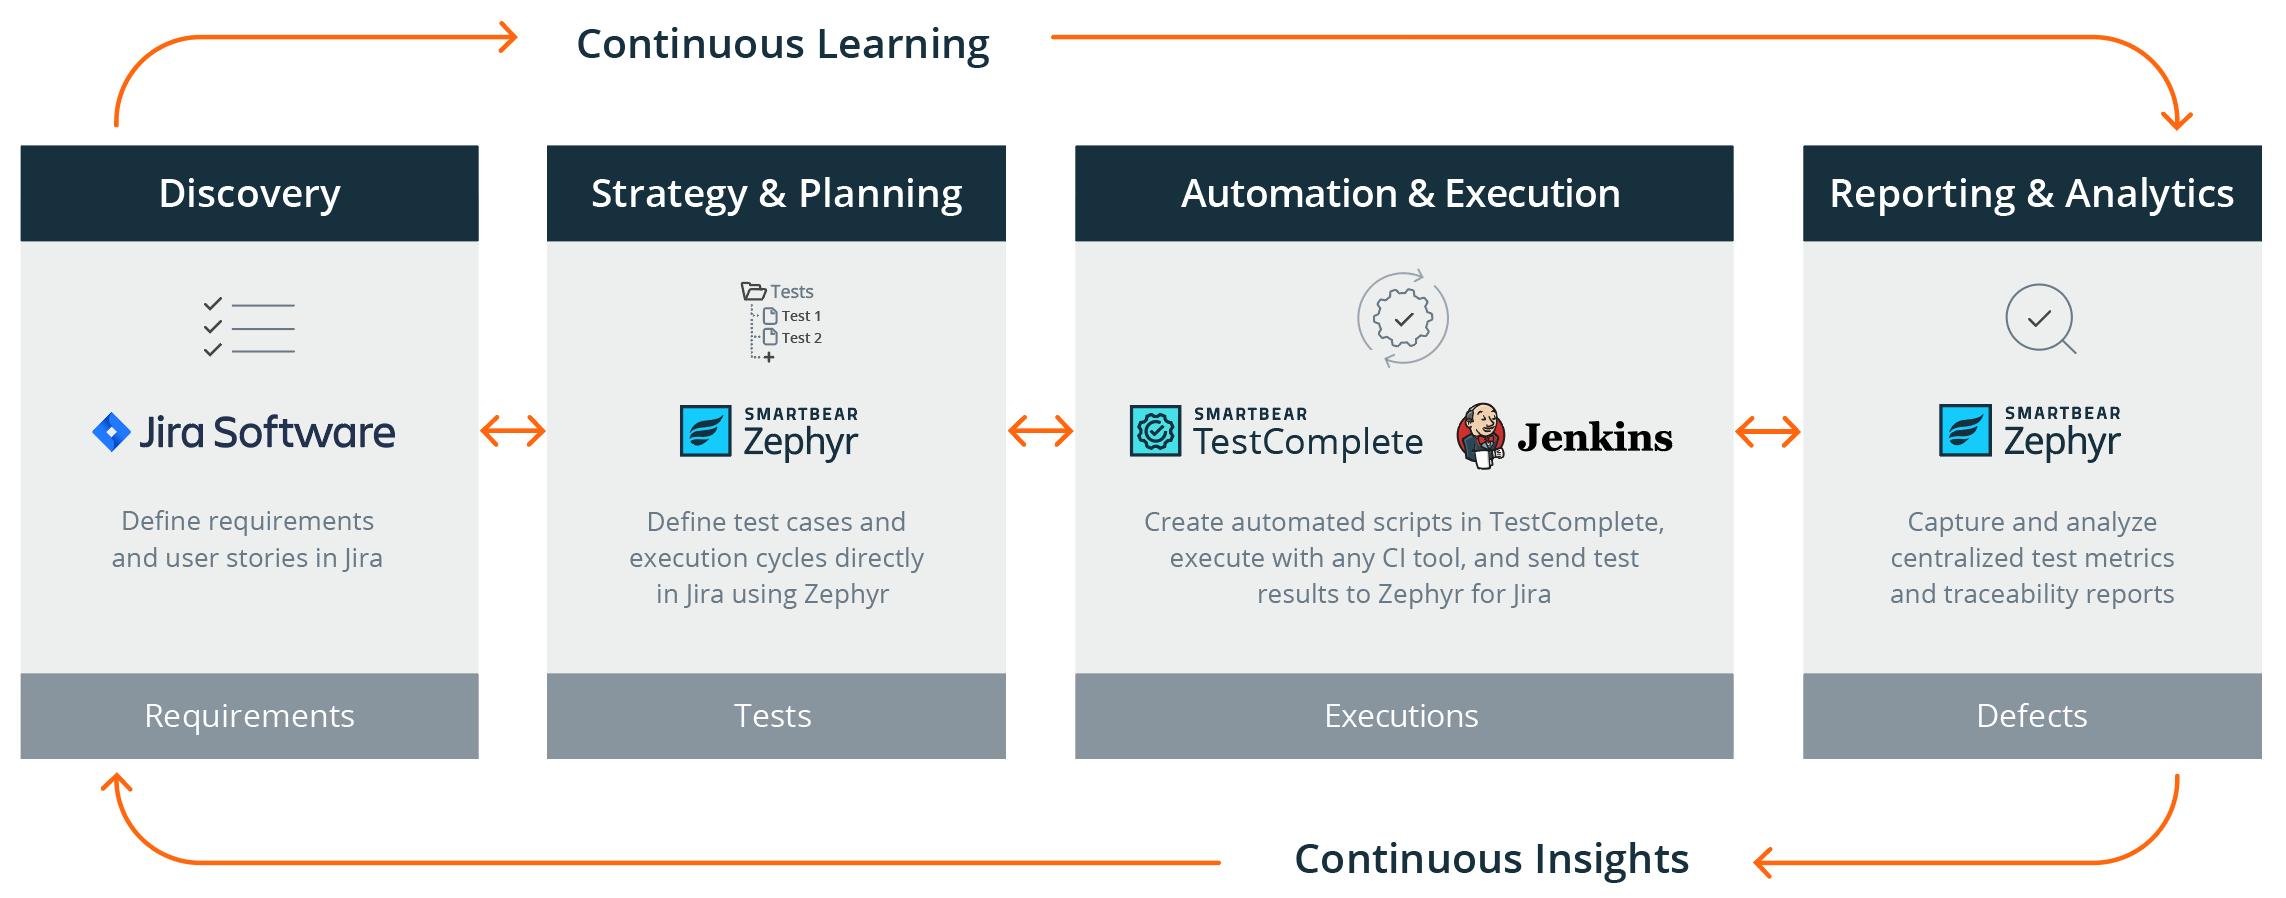 TestComplete and Zephyr Integration | SmartBear